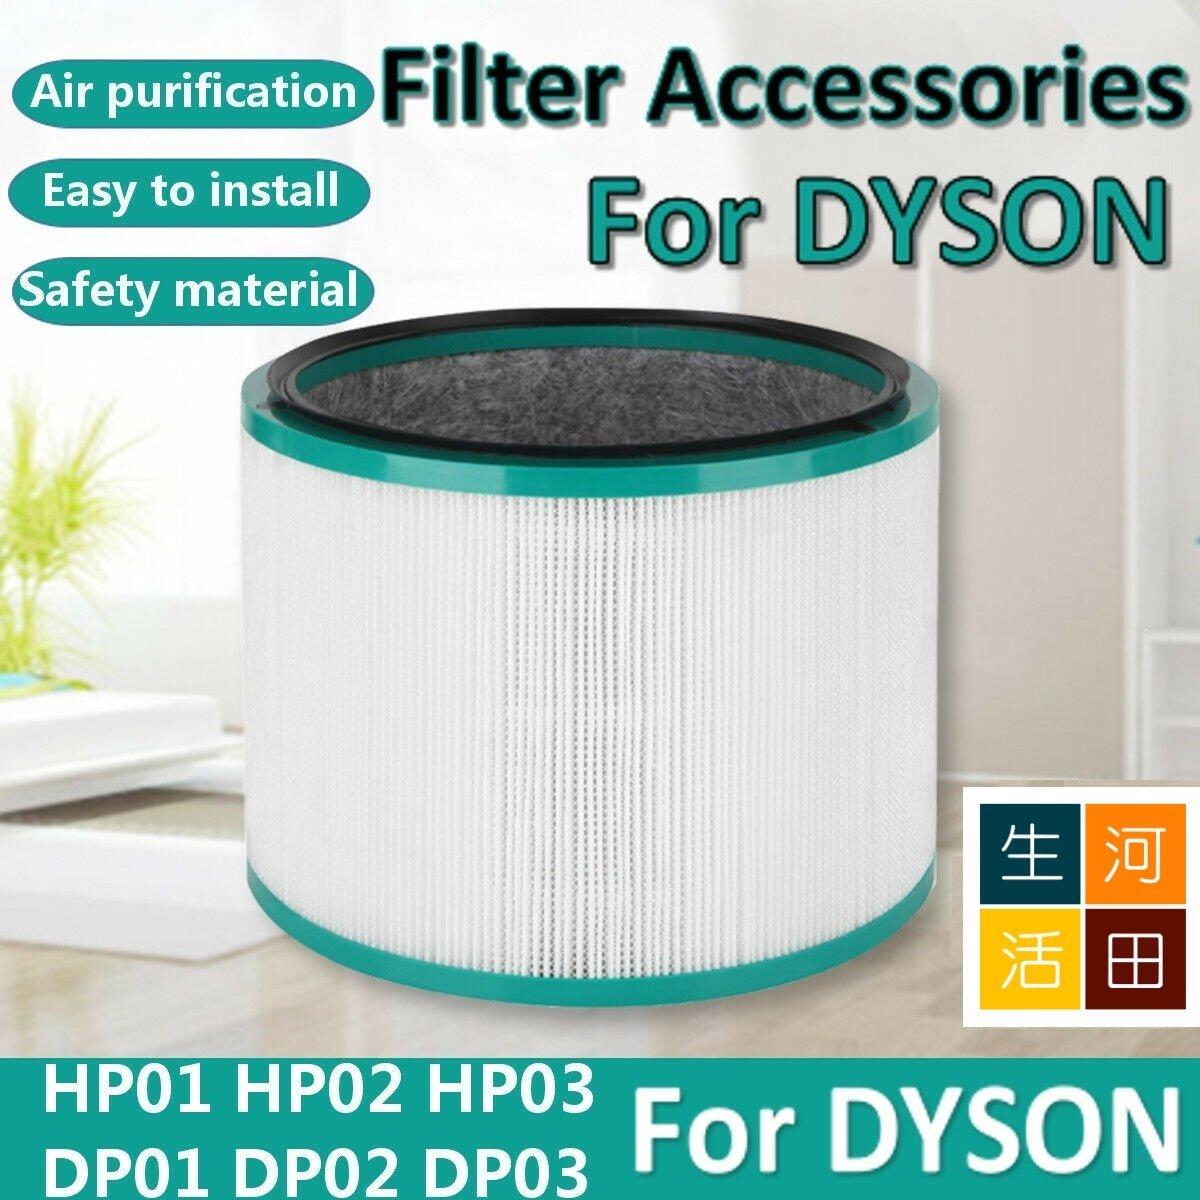 Dyson Pure Hot + Cool HP00 HP01 HP02 HP03 Pure Cool Link DP01 DP03 空氣清新機HEPA 代用濾網濾芯